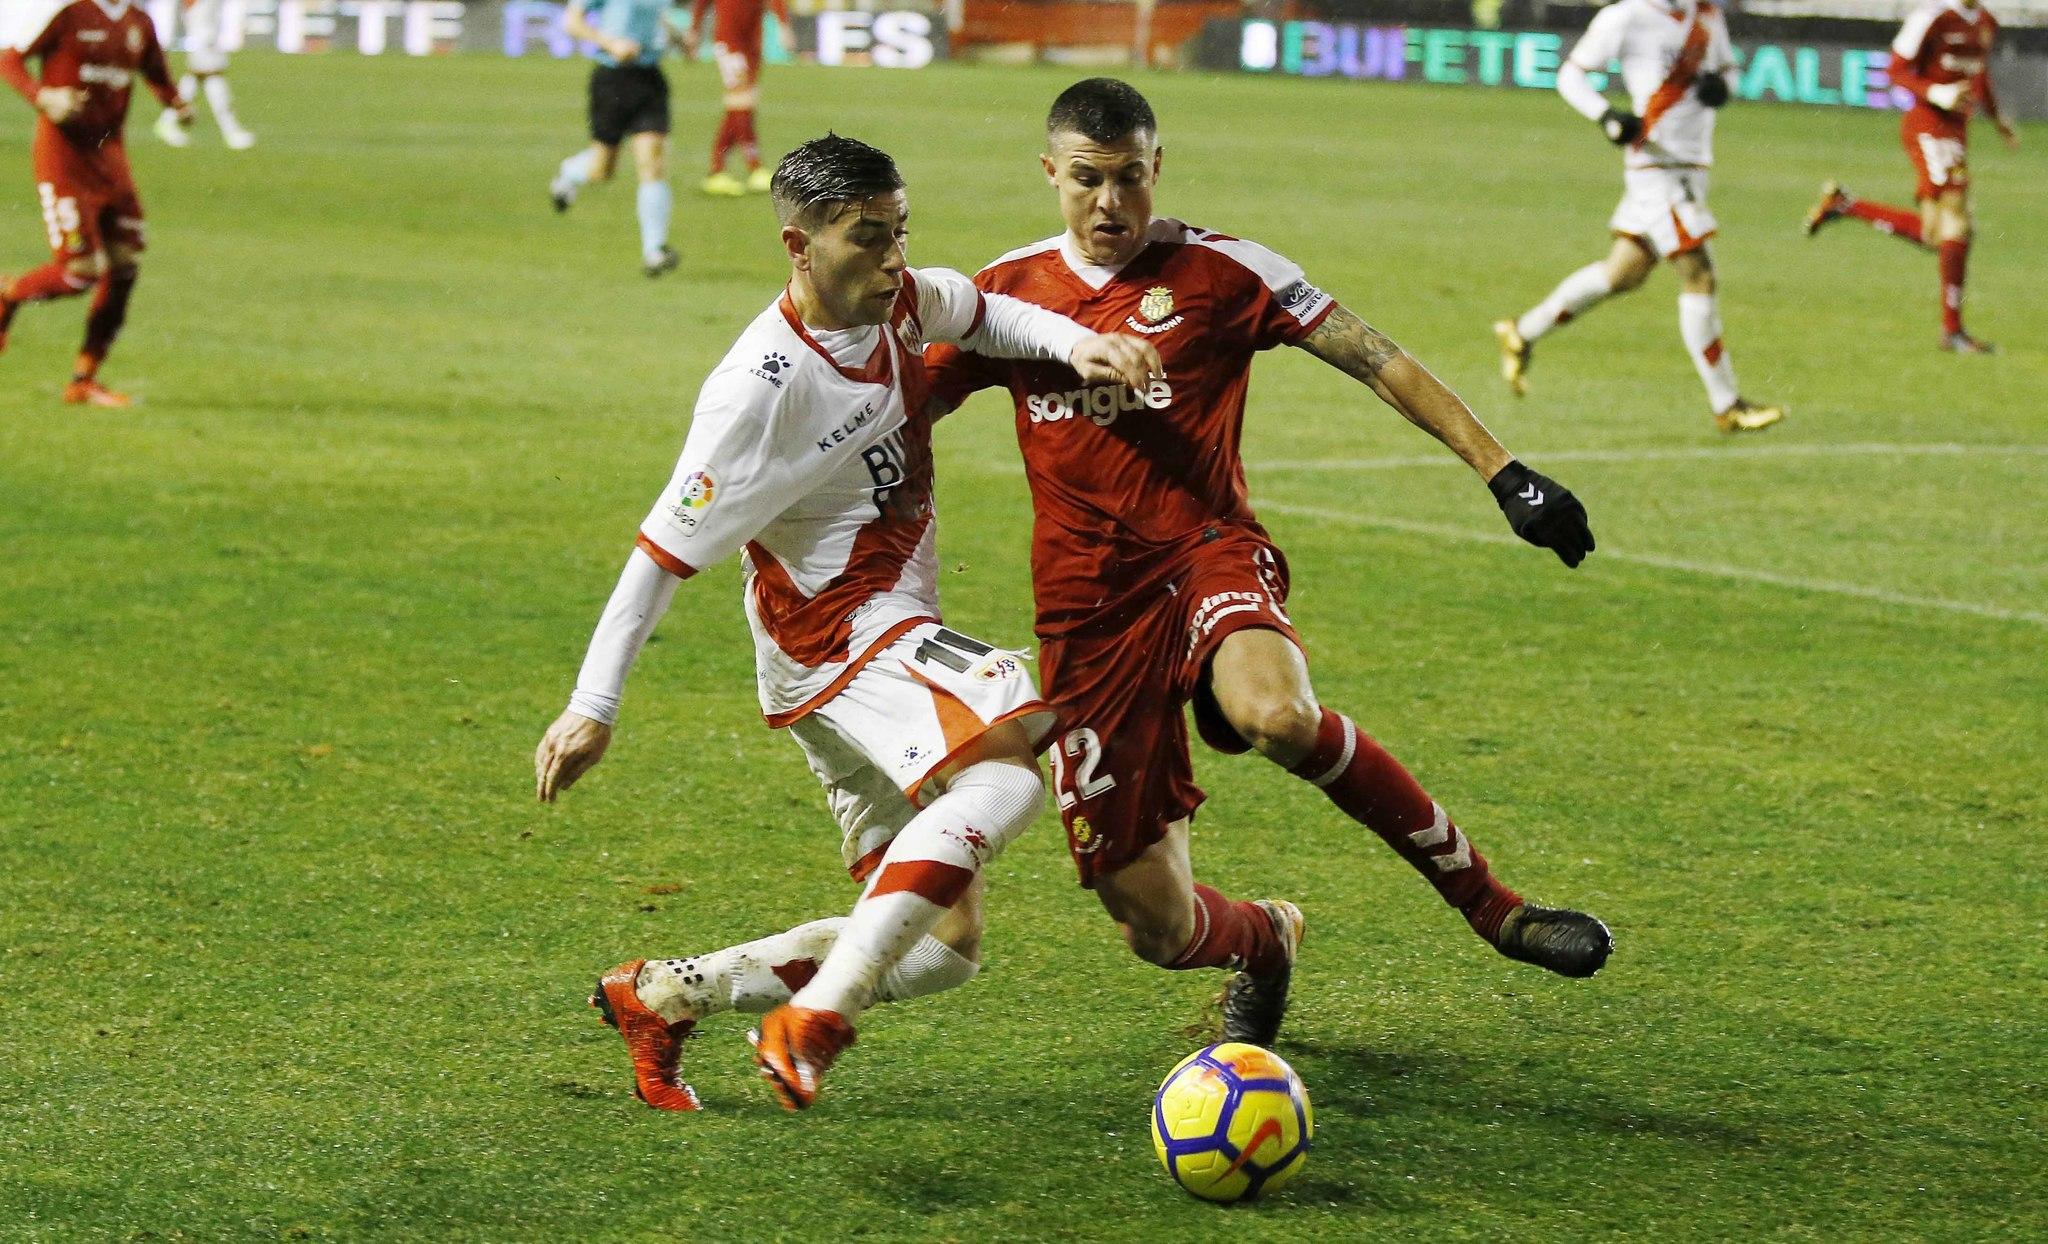 Liga 123: Manu Barreiro tumba al Rayo | Marca.com